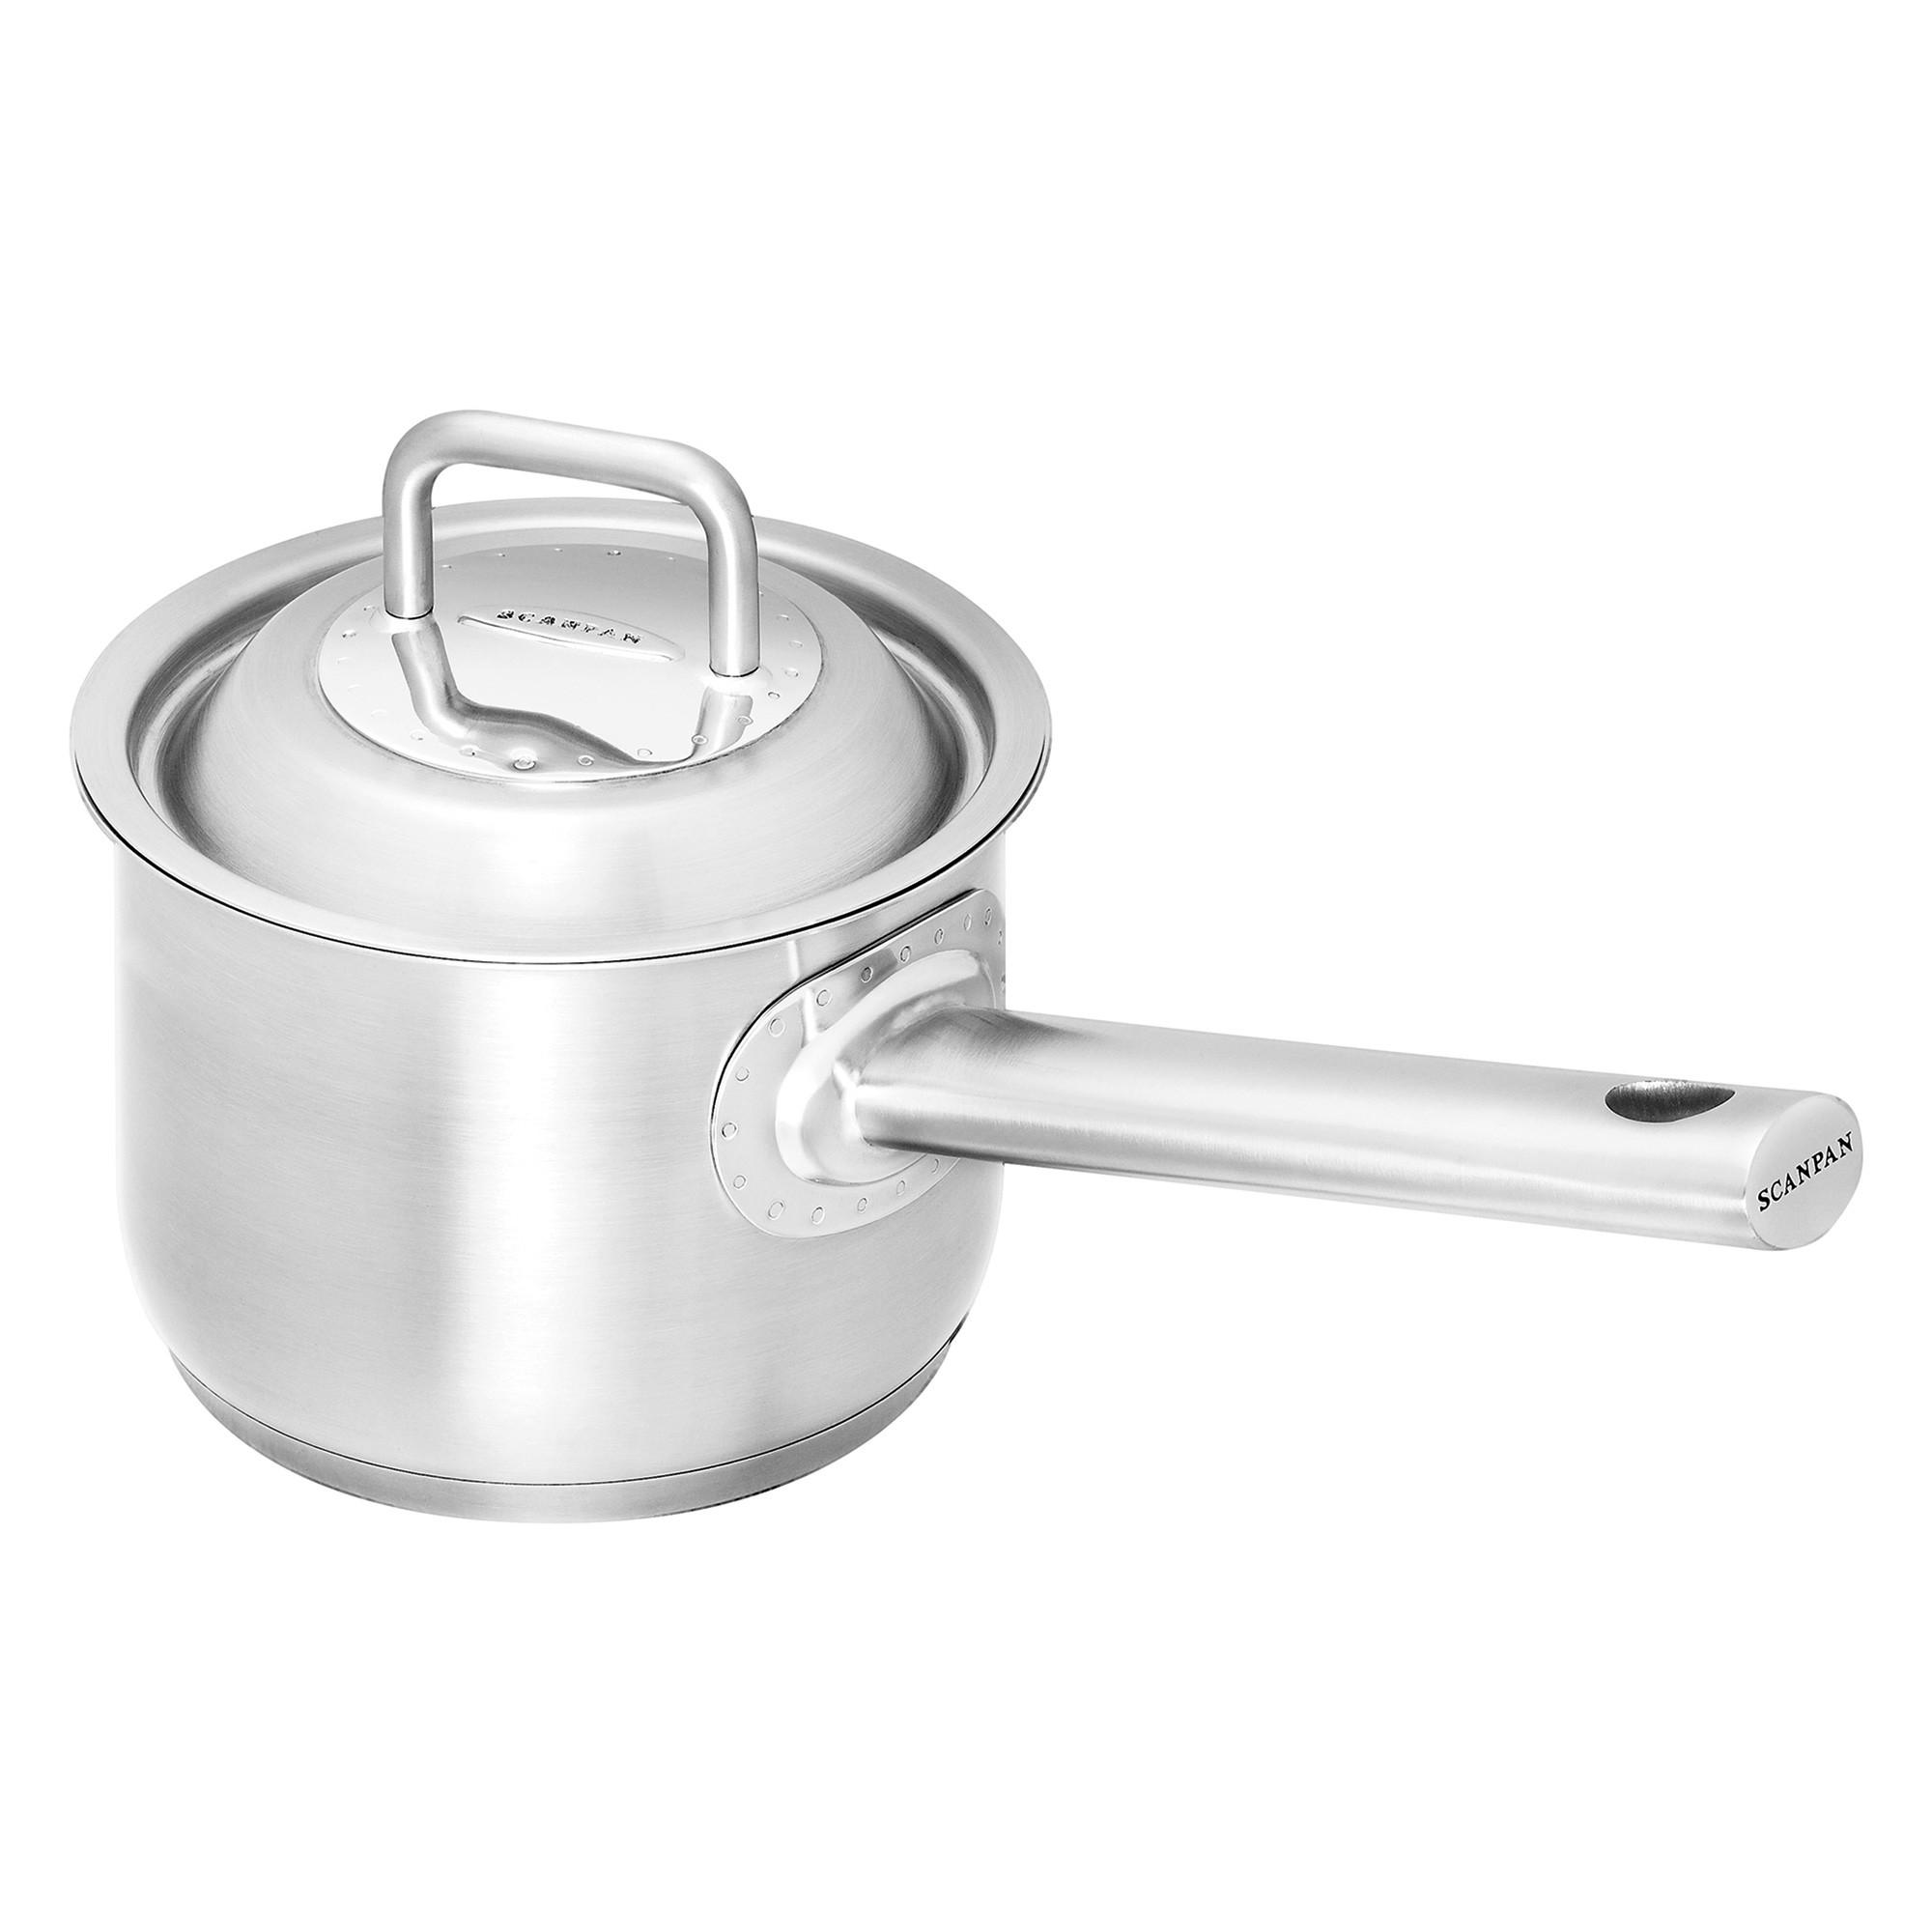 Scanpan Commercial 14cm/1.2L Saucepan